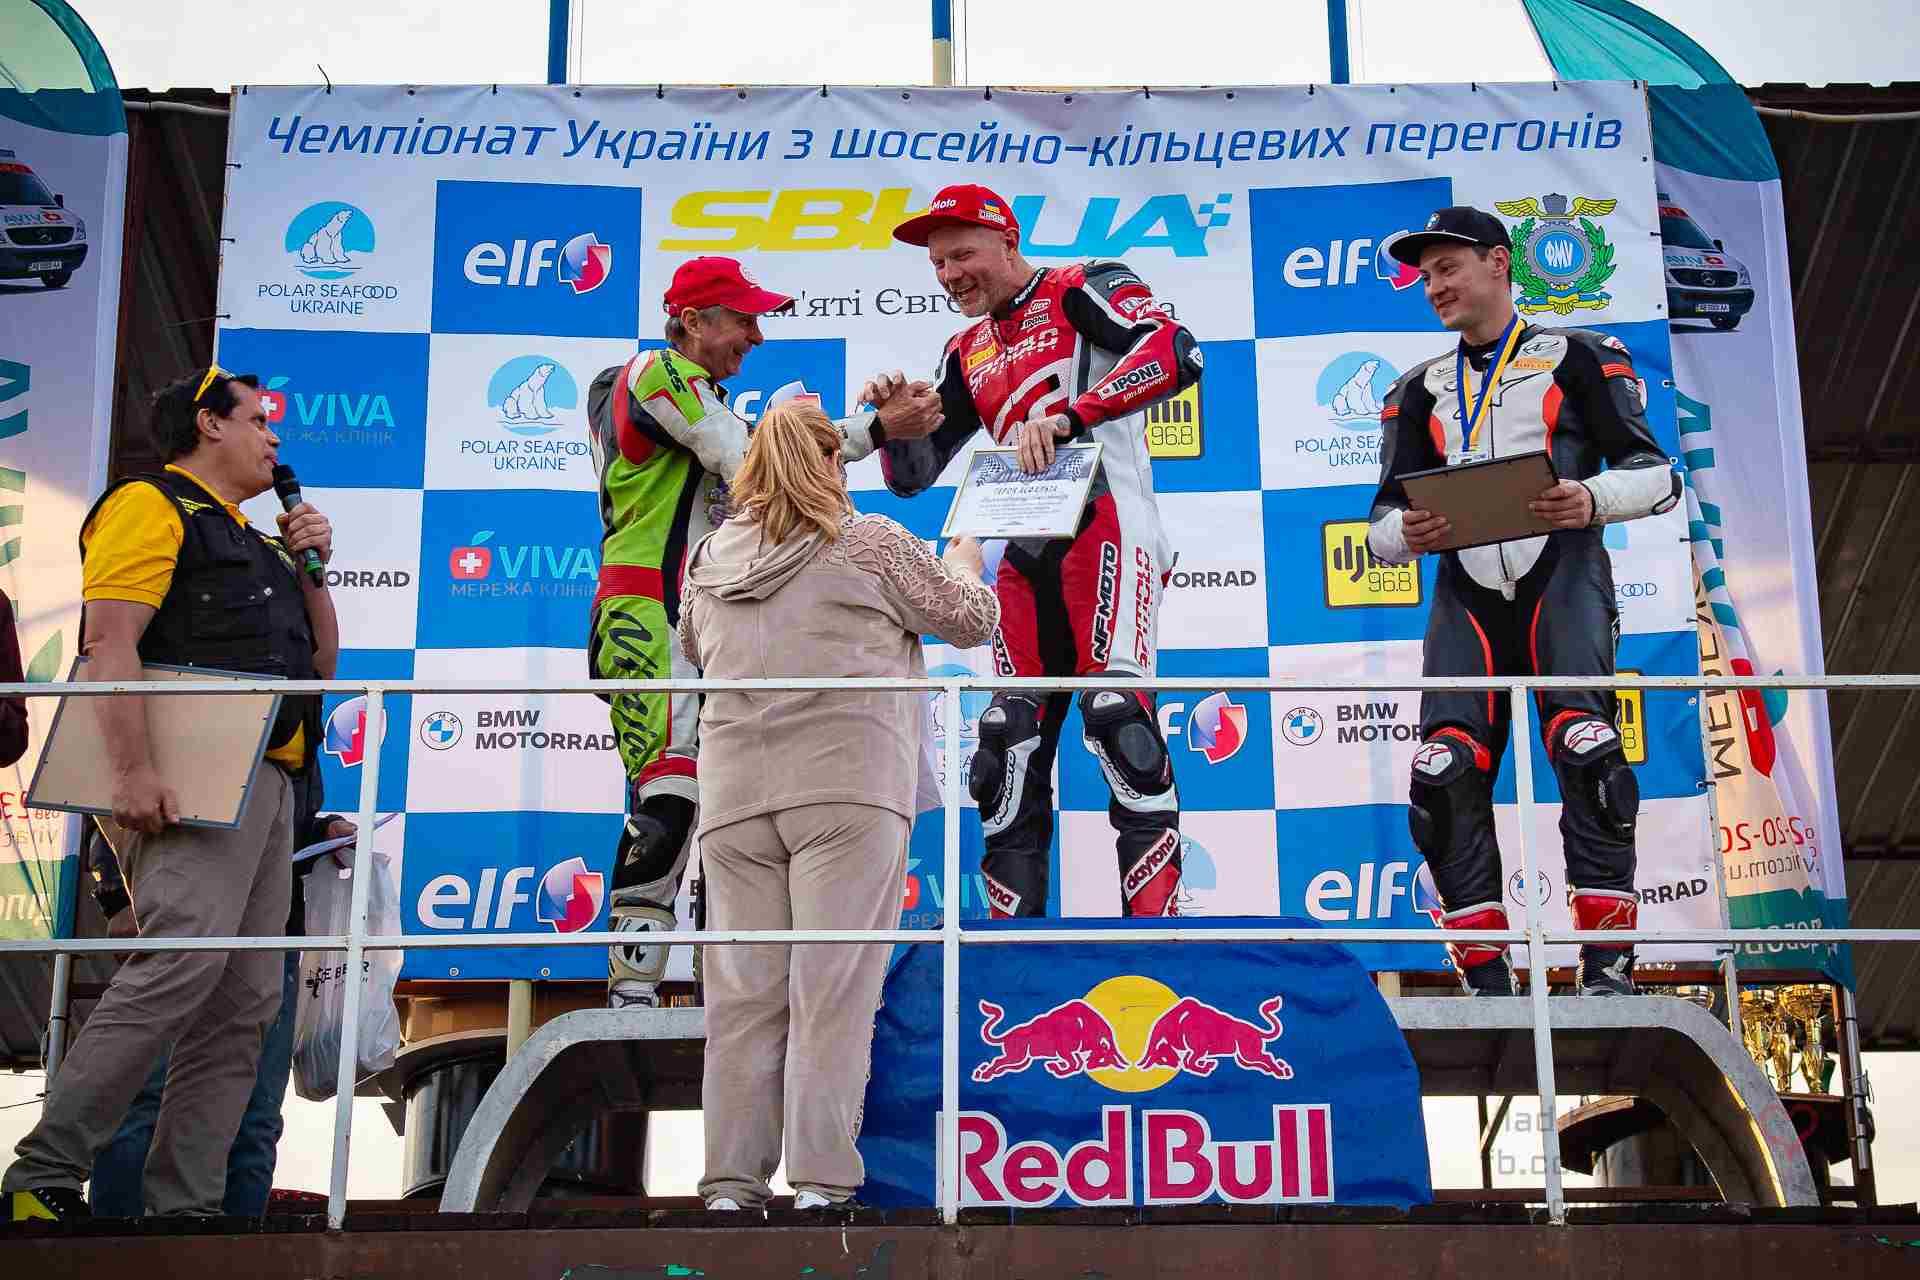 5-6_etap_MotoGPUkraine_146